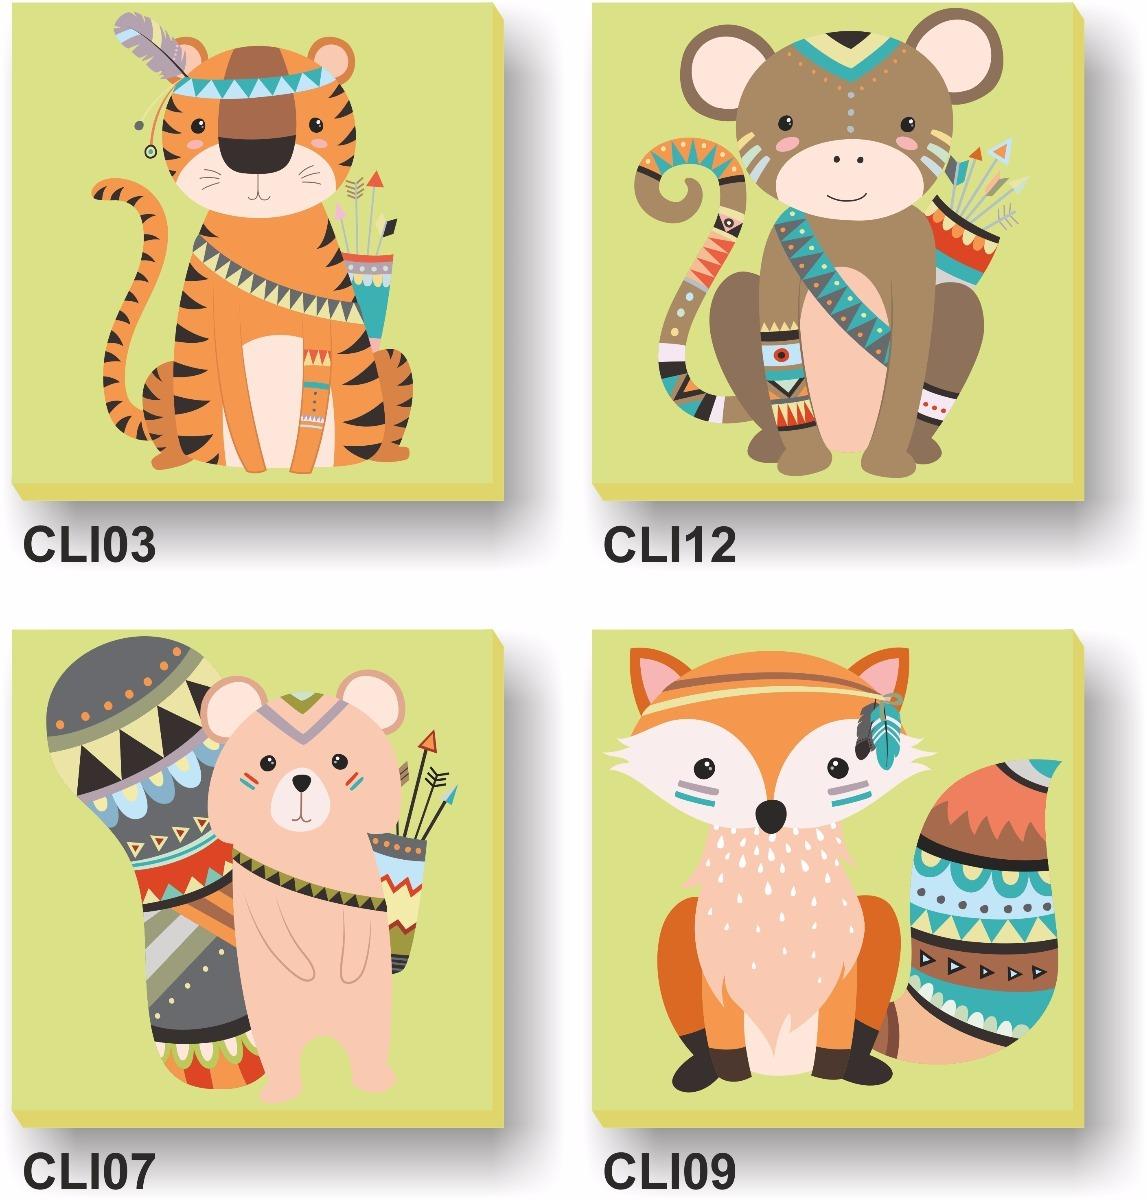 4 Cuadritos Lienzo 20x20cm Infantiles Animales Oso Tigre Etc  # Muebles Tigre Infantiles